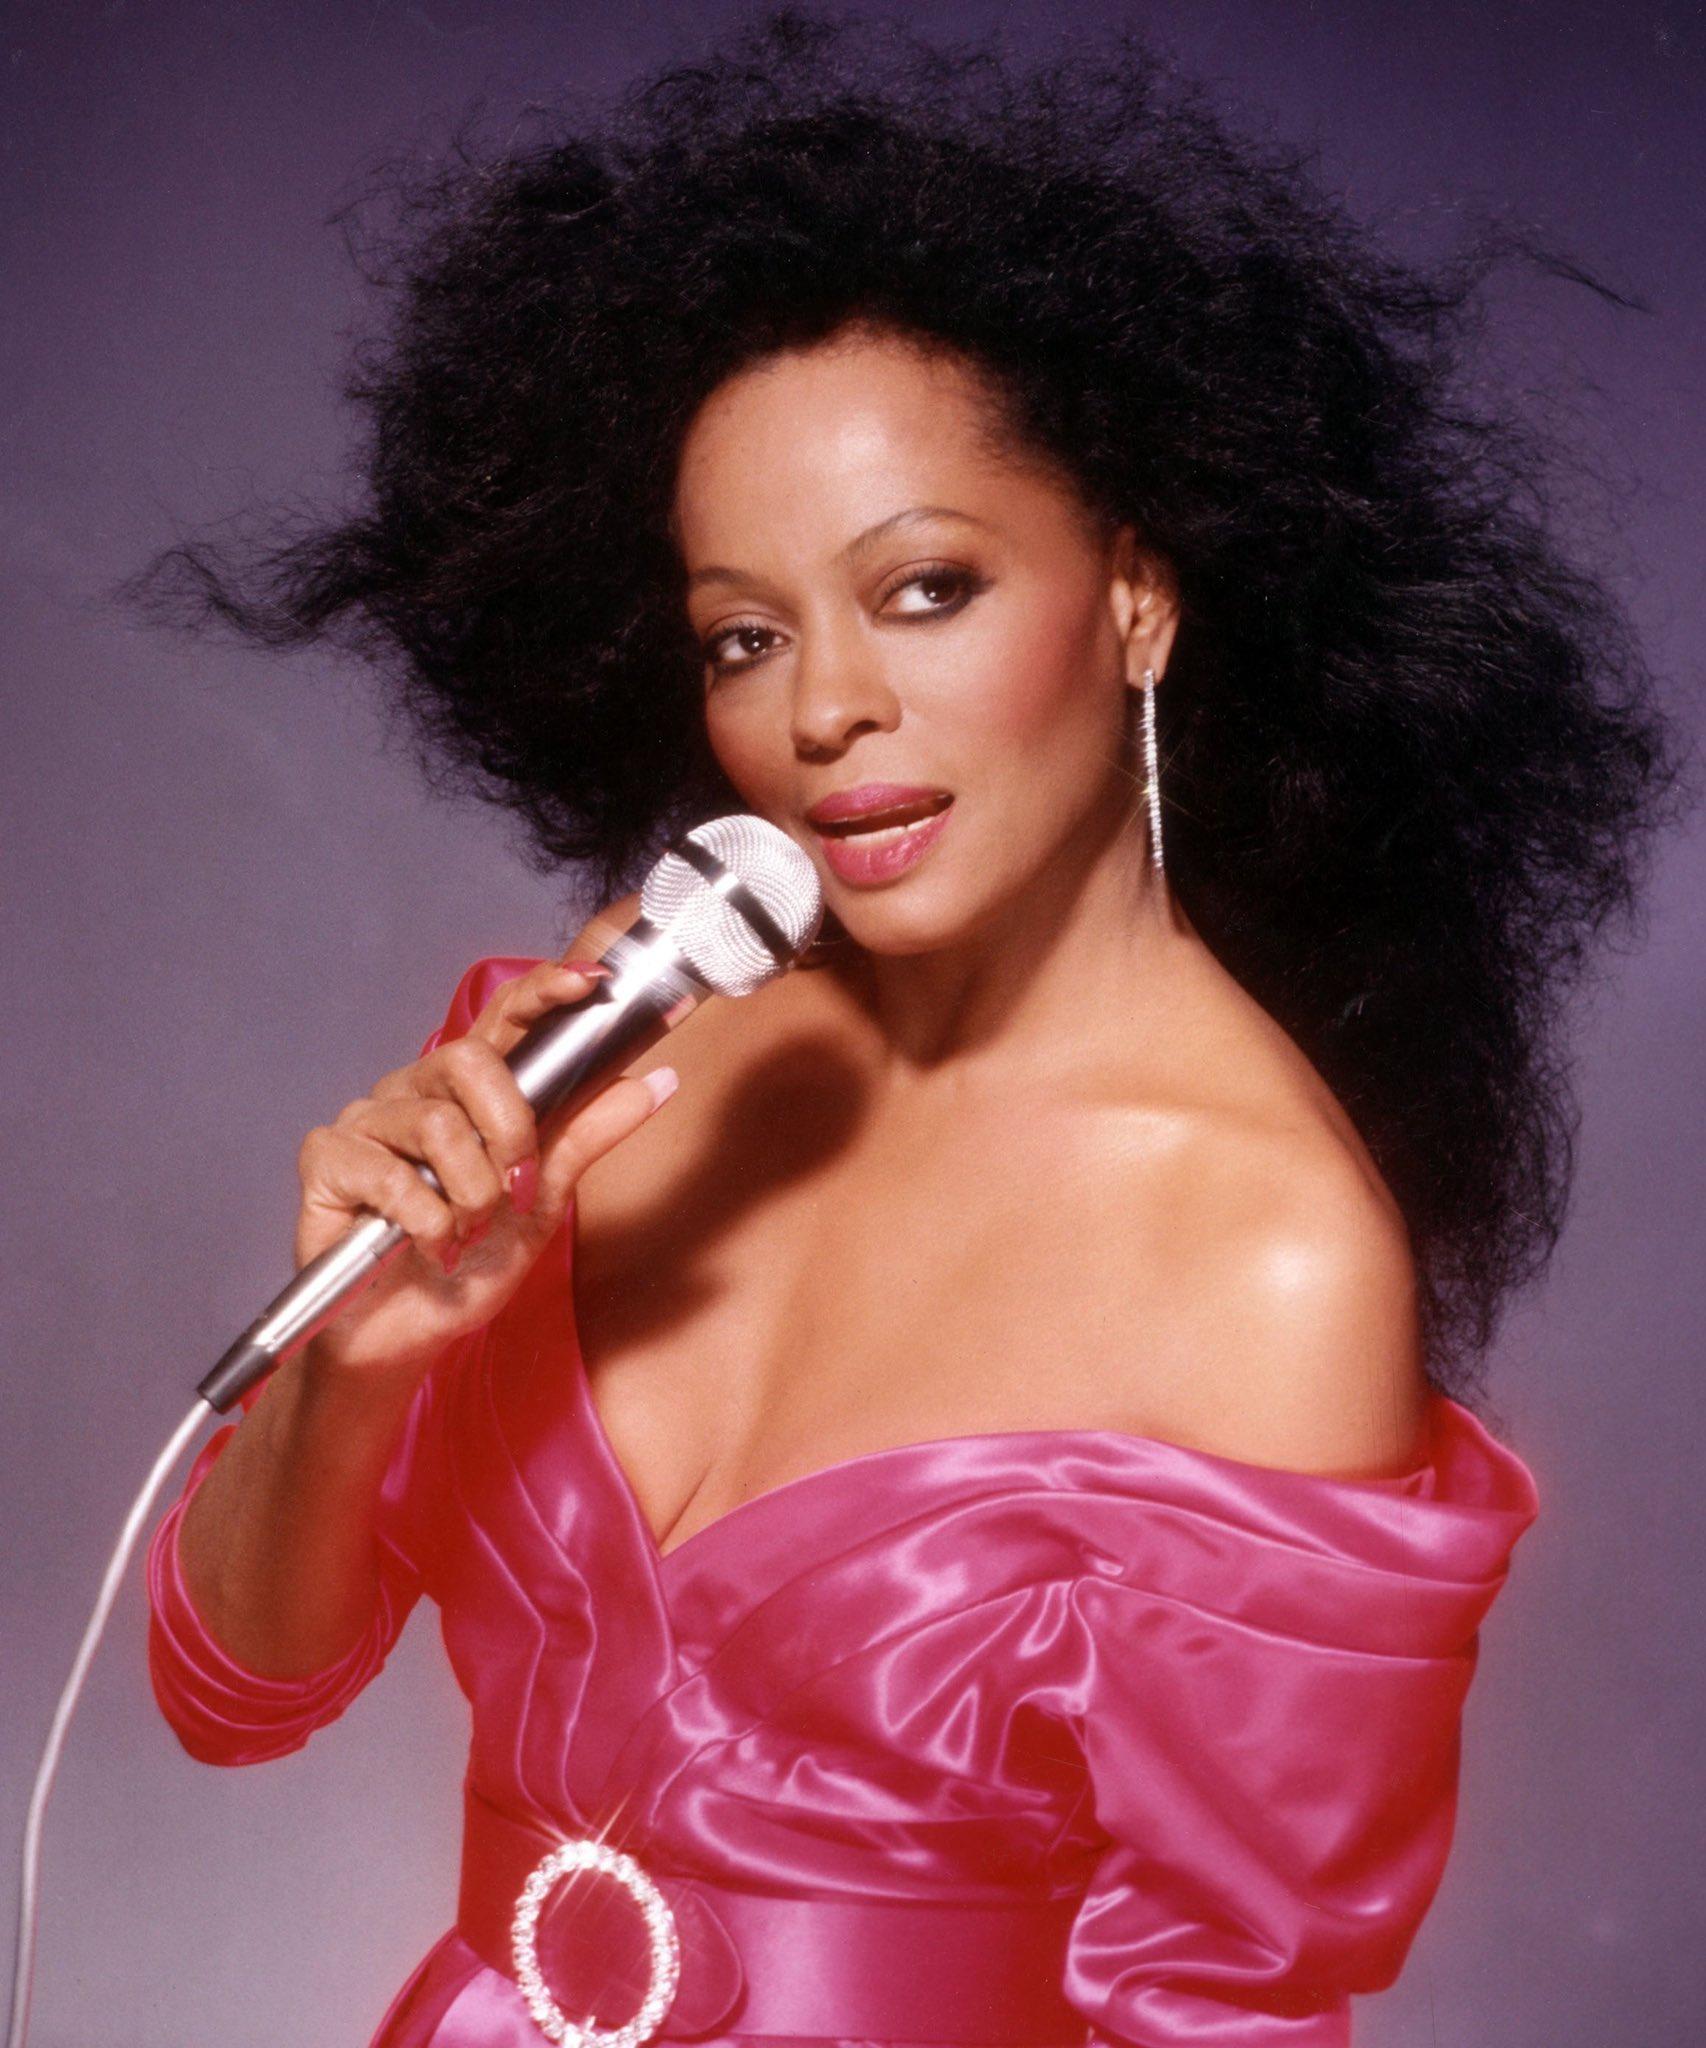 Happy Birthday to Ms. Diana Ross